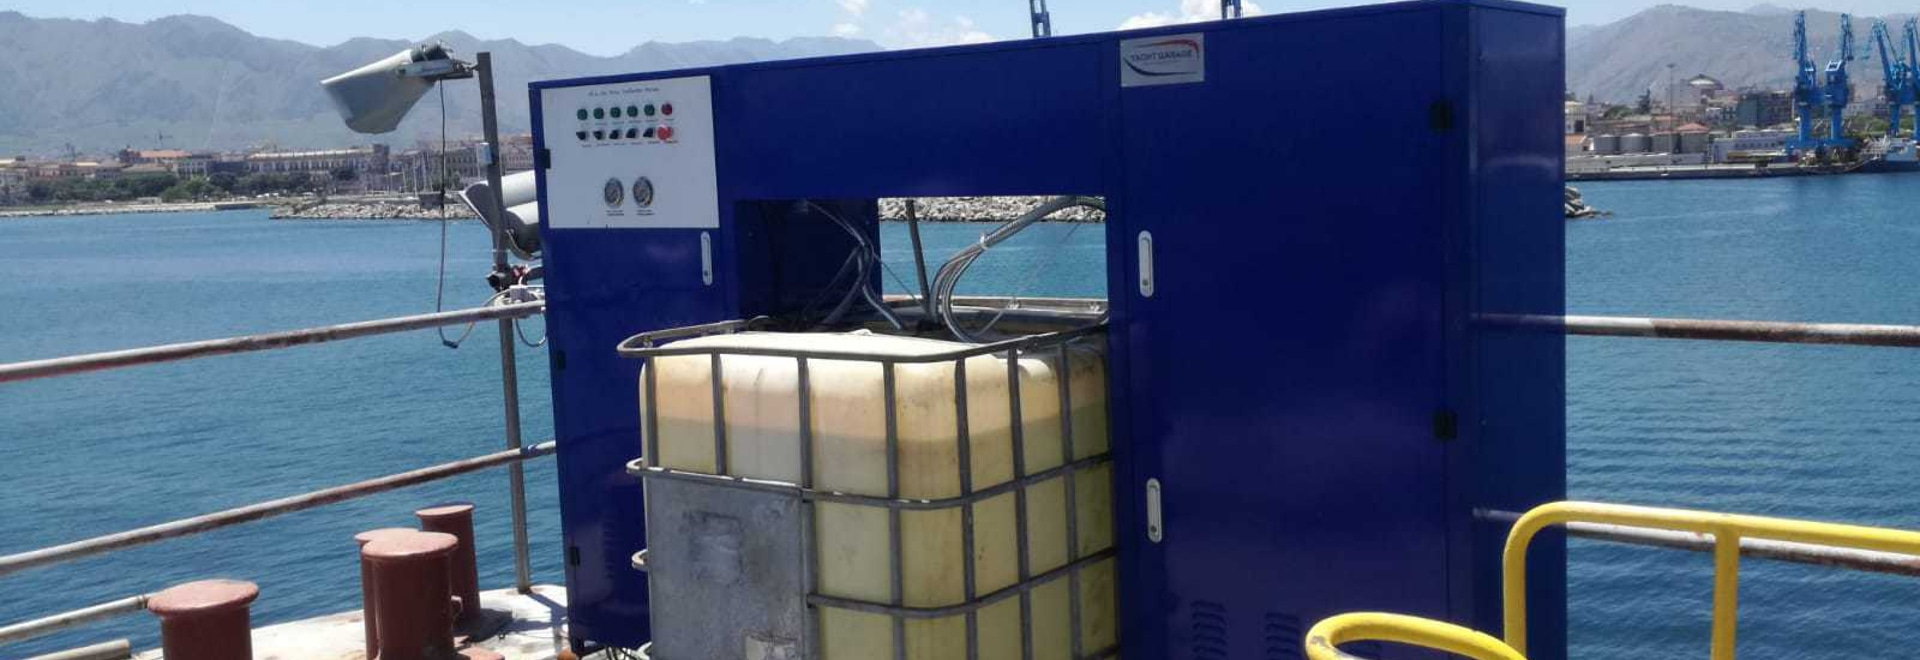 Shipyard's water treatment Plant